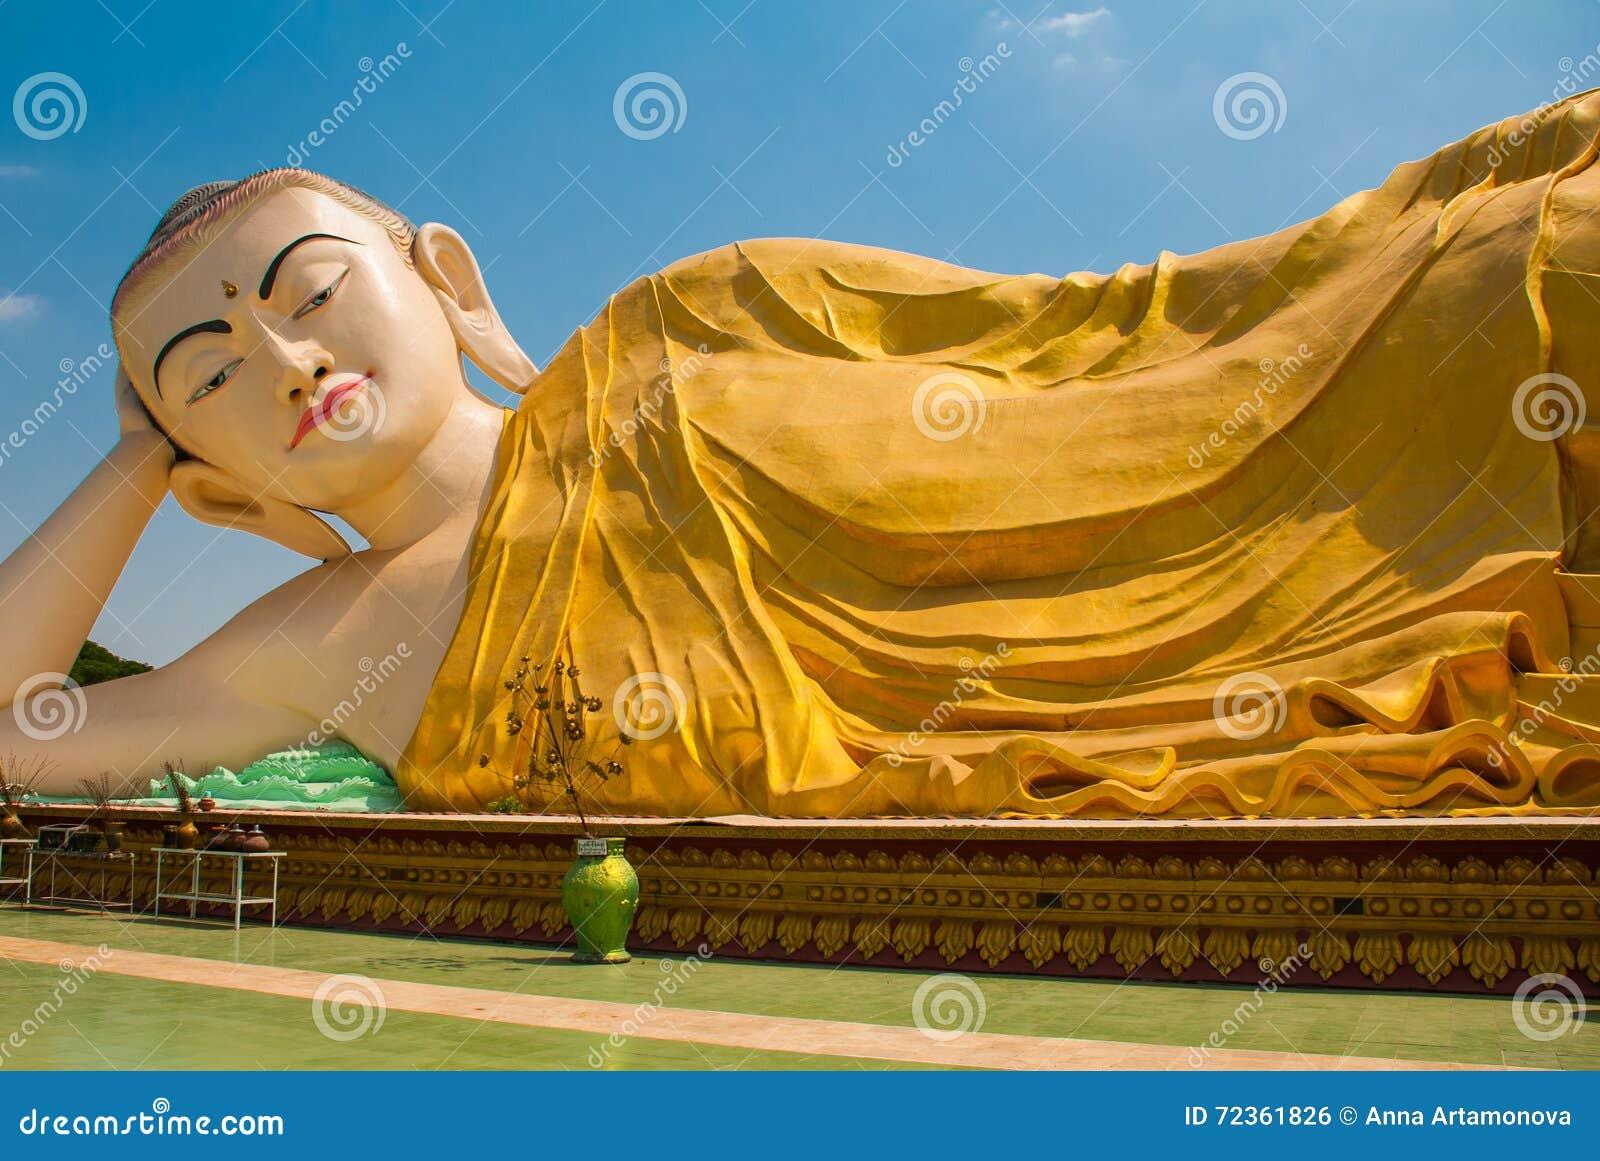 砂海螂Tha Lyaung斜倚的菩萨 Bago Myanma 缅甸